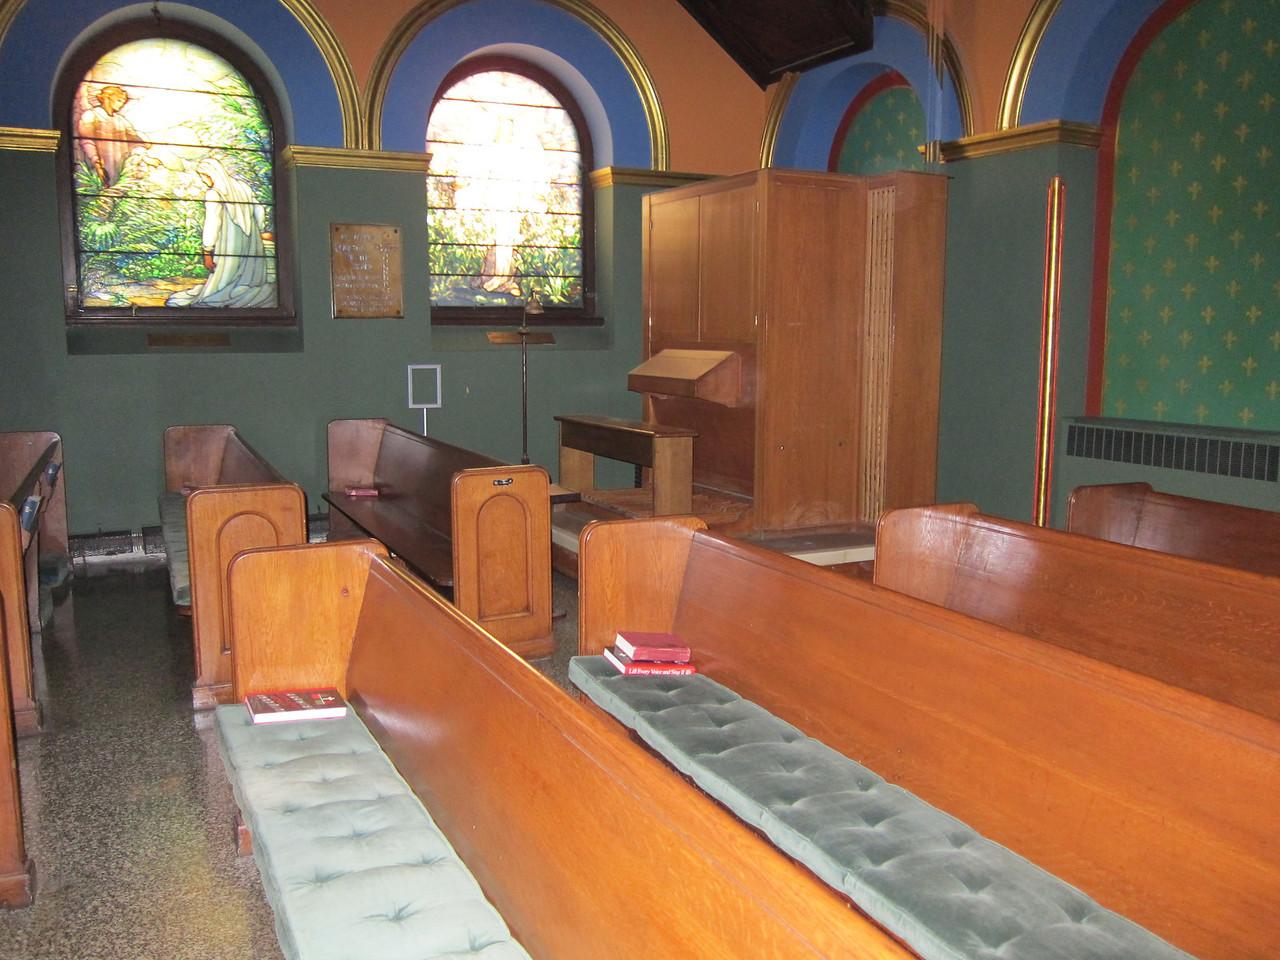 St Michael's Church_2013-11-26_4493_chapel seating